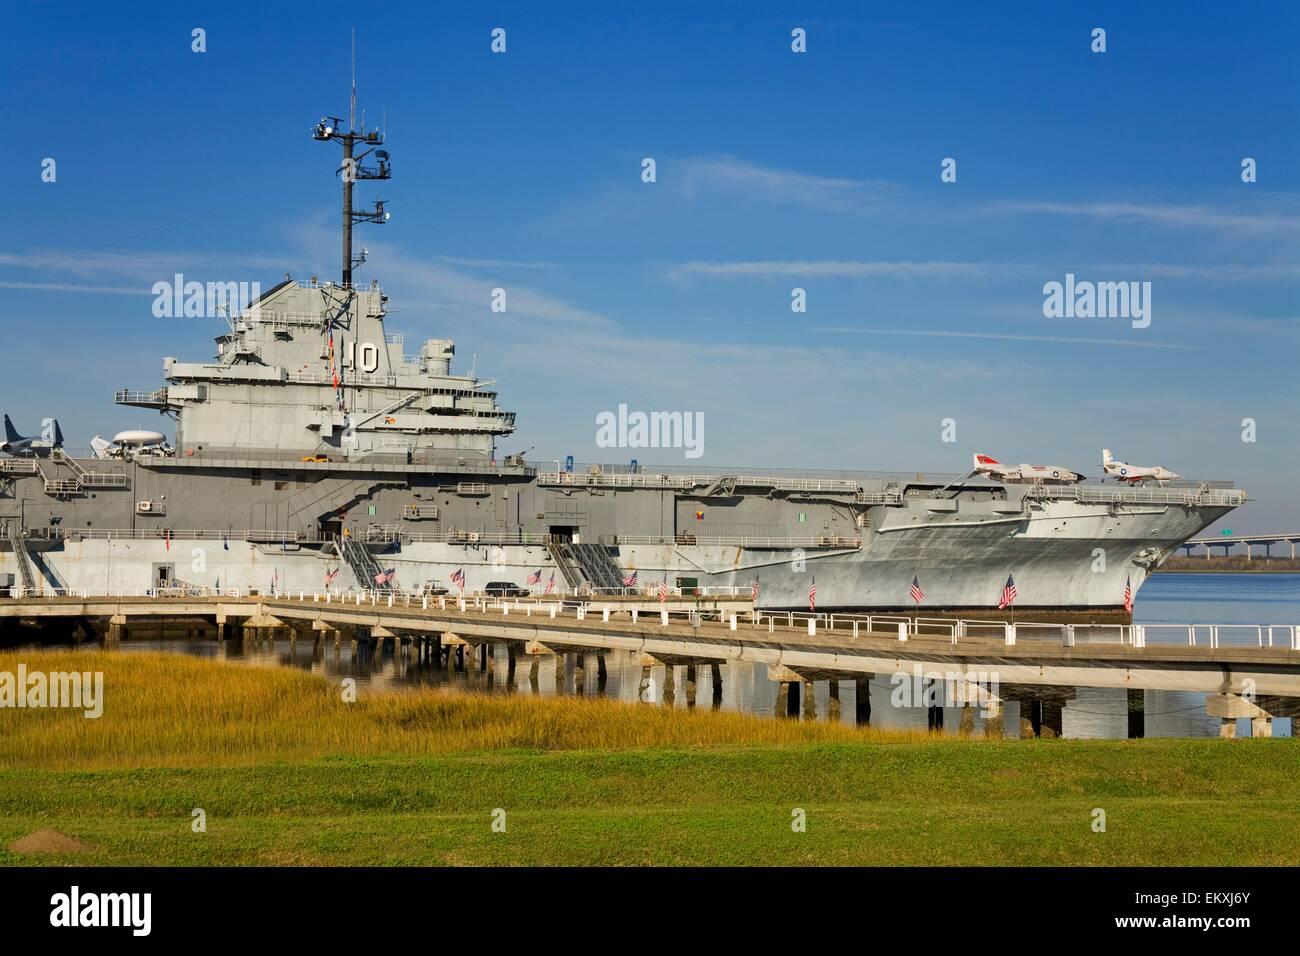 Uss Yorktown Aircraft Carrier Patriots Point Naval Maritime Stock